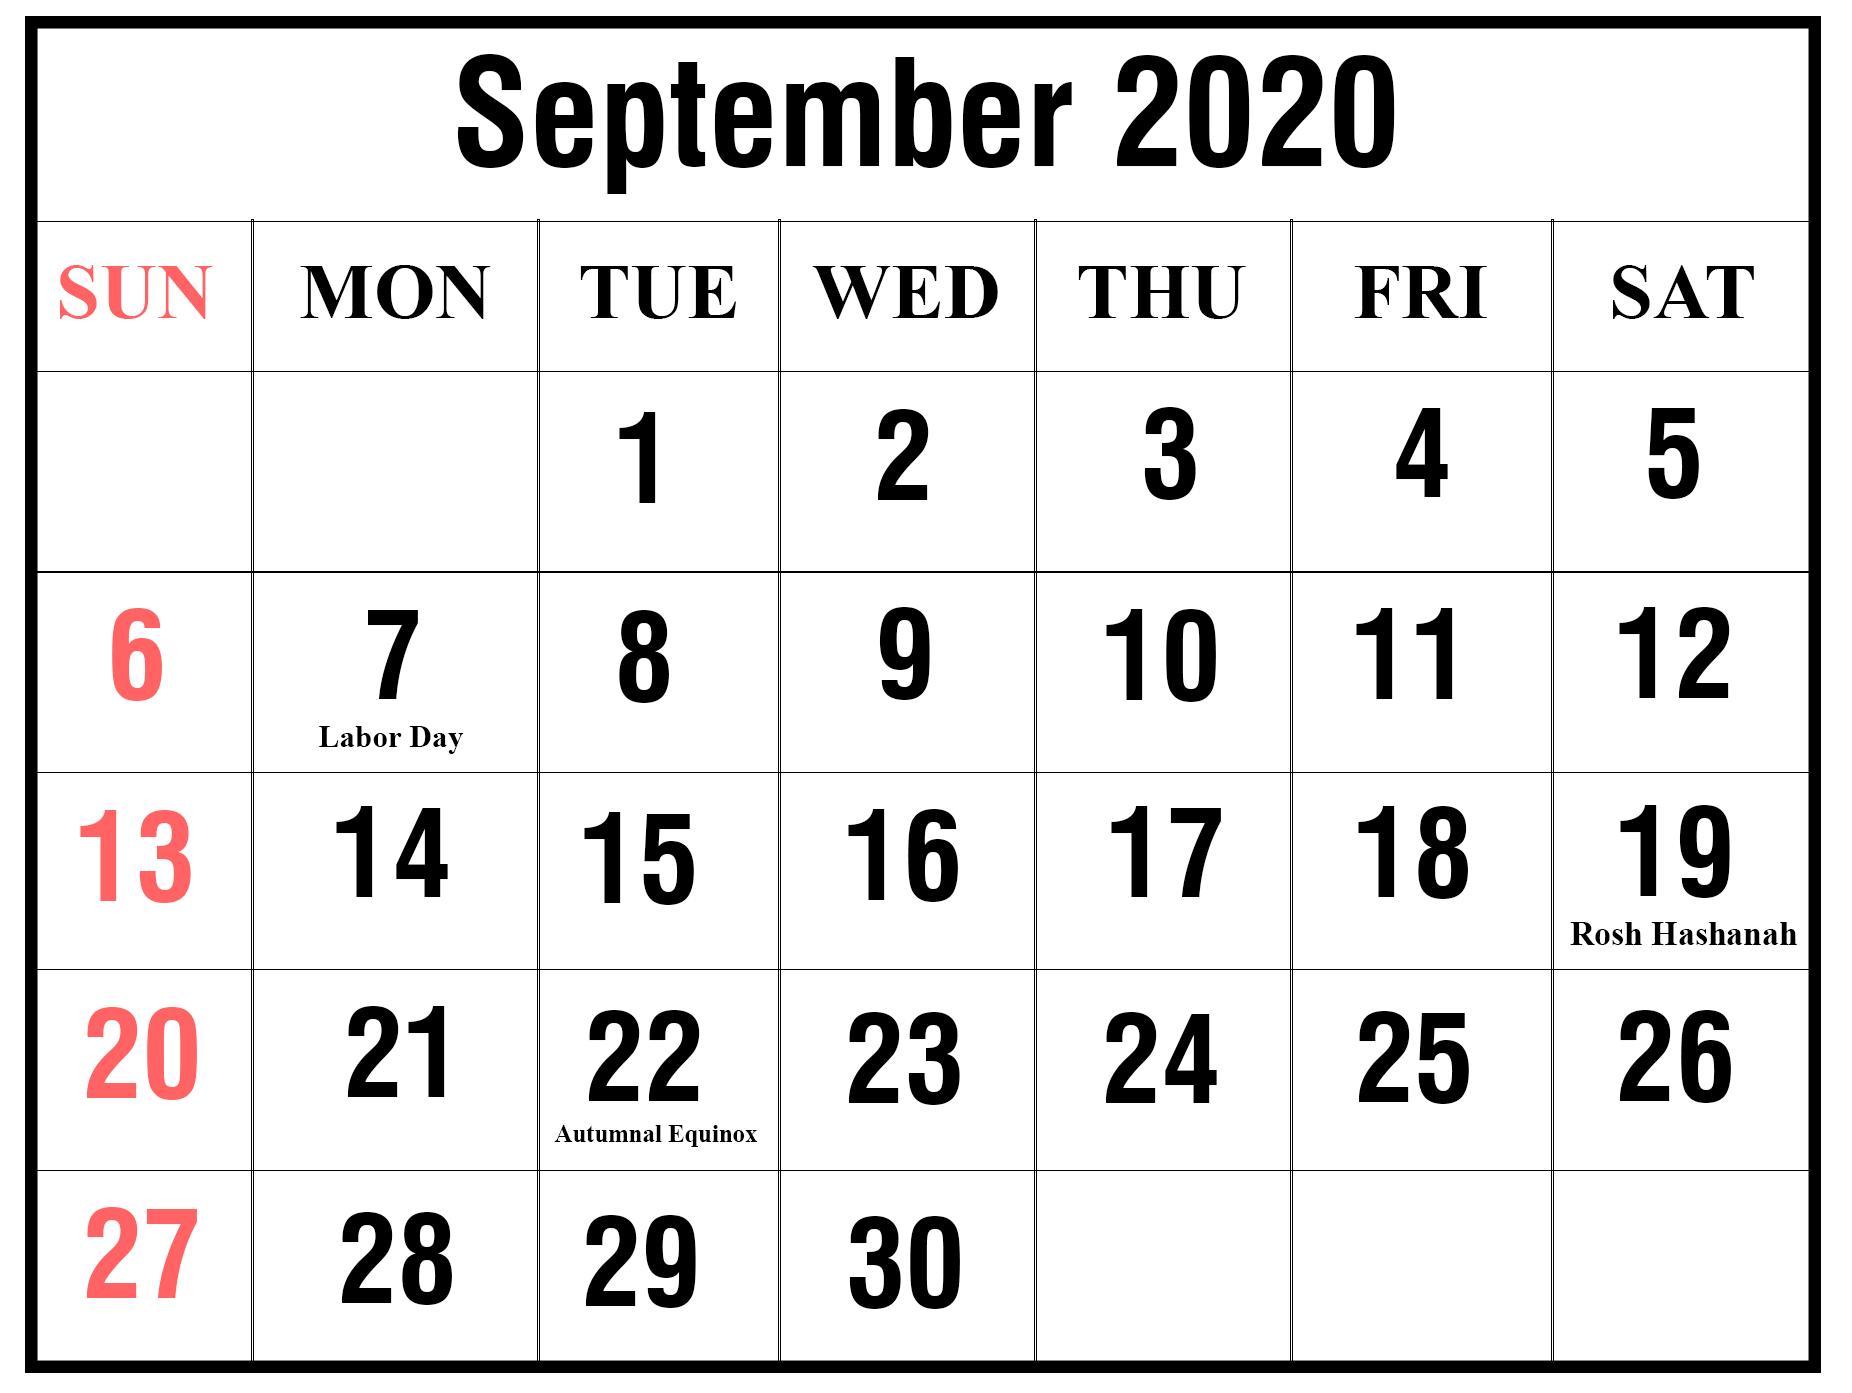 September 2020 Holidays Calendar